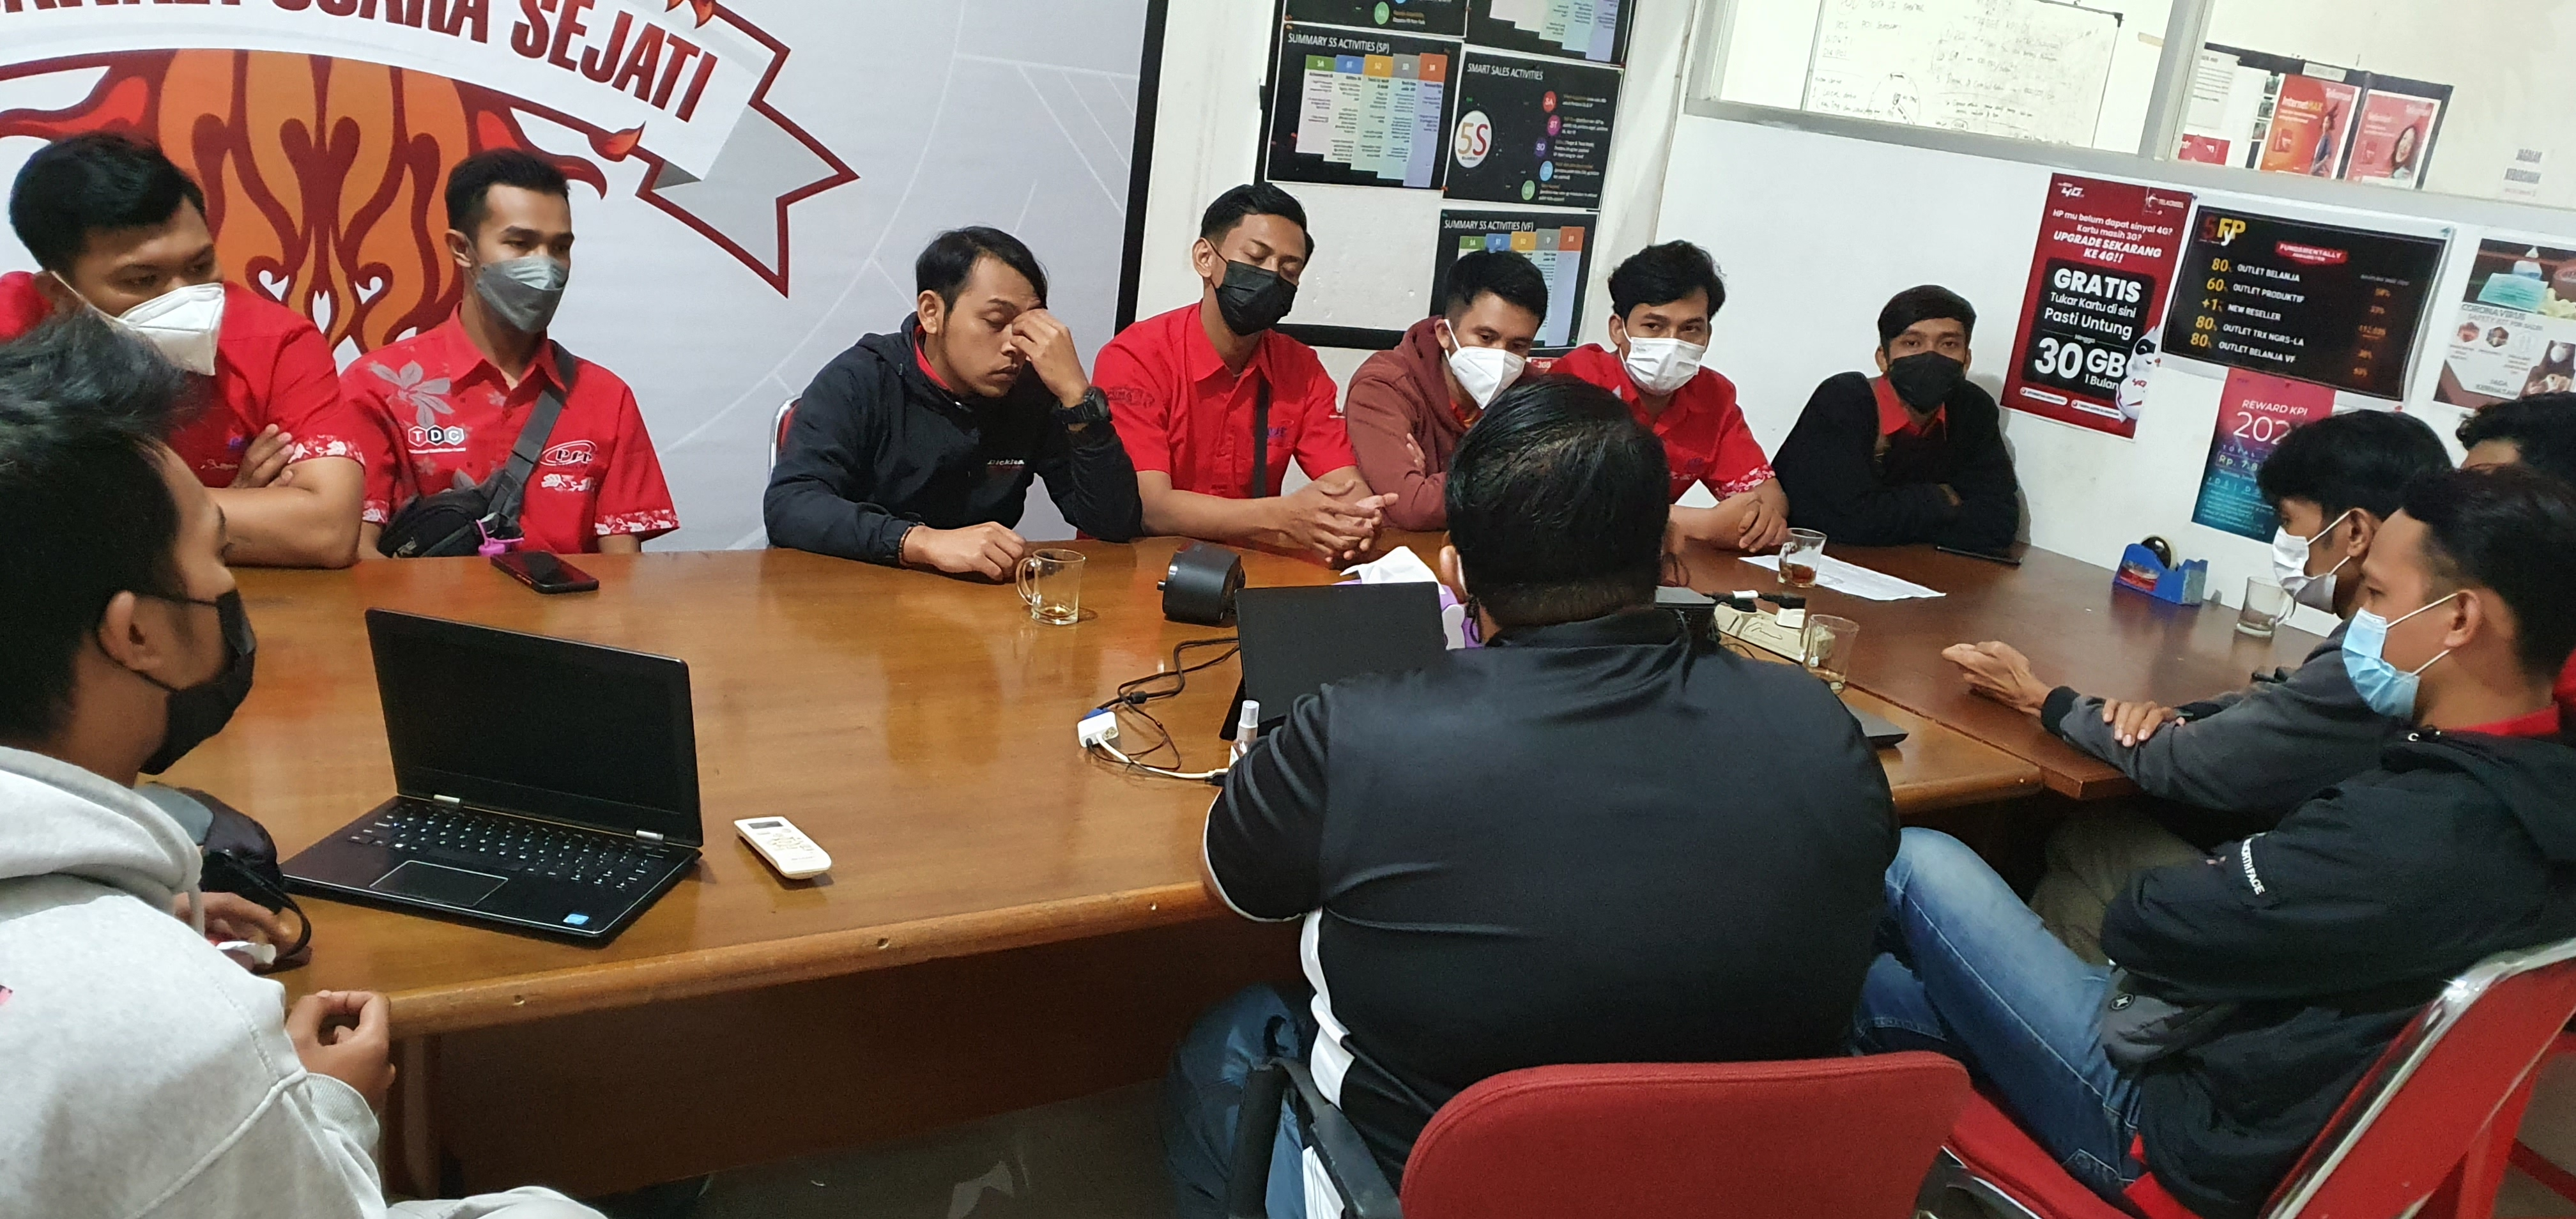 BC Outlet Temanggung with Manager Branch Jogja